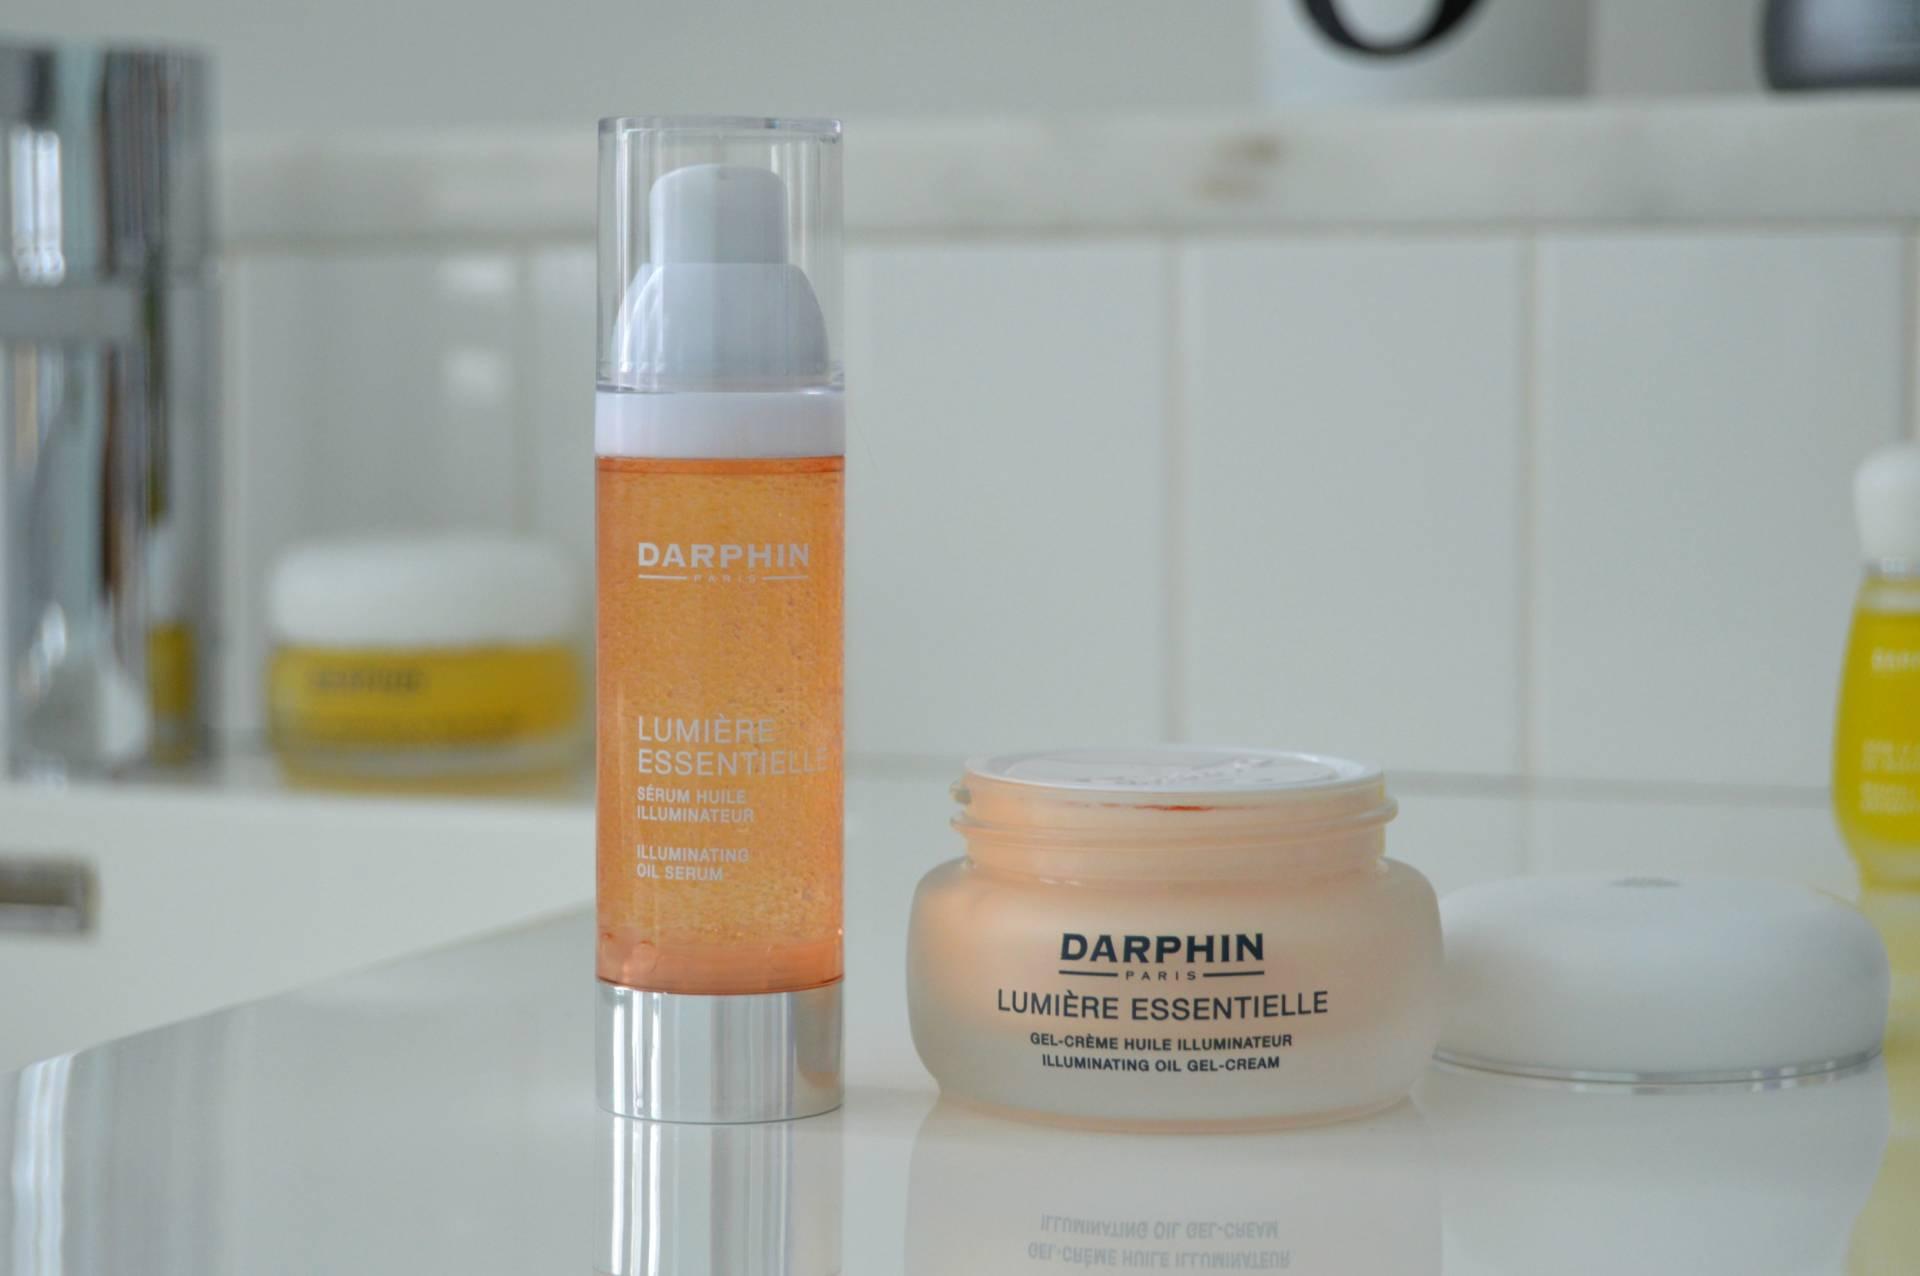 Parisian Glow Skin >> Darphin Lumière Essentielle - Illuminating Skincare ...